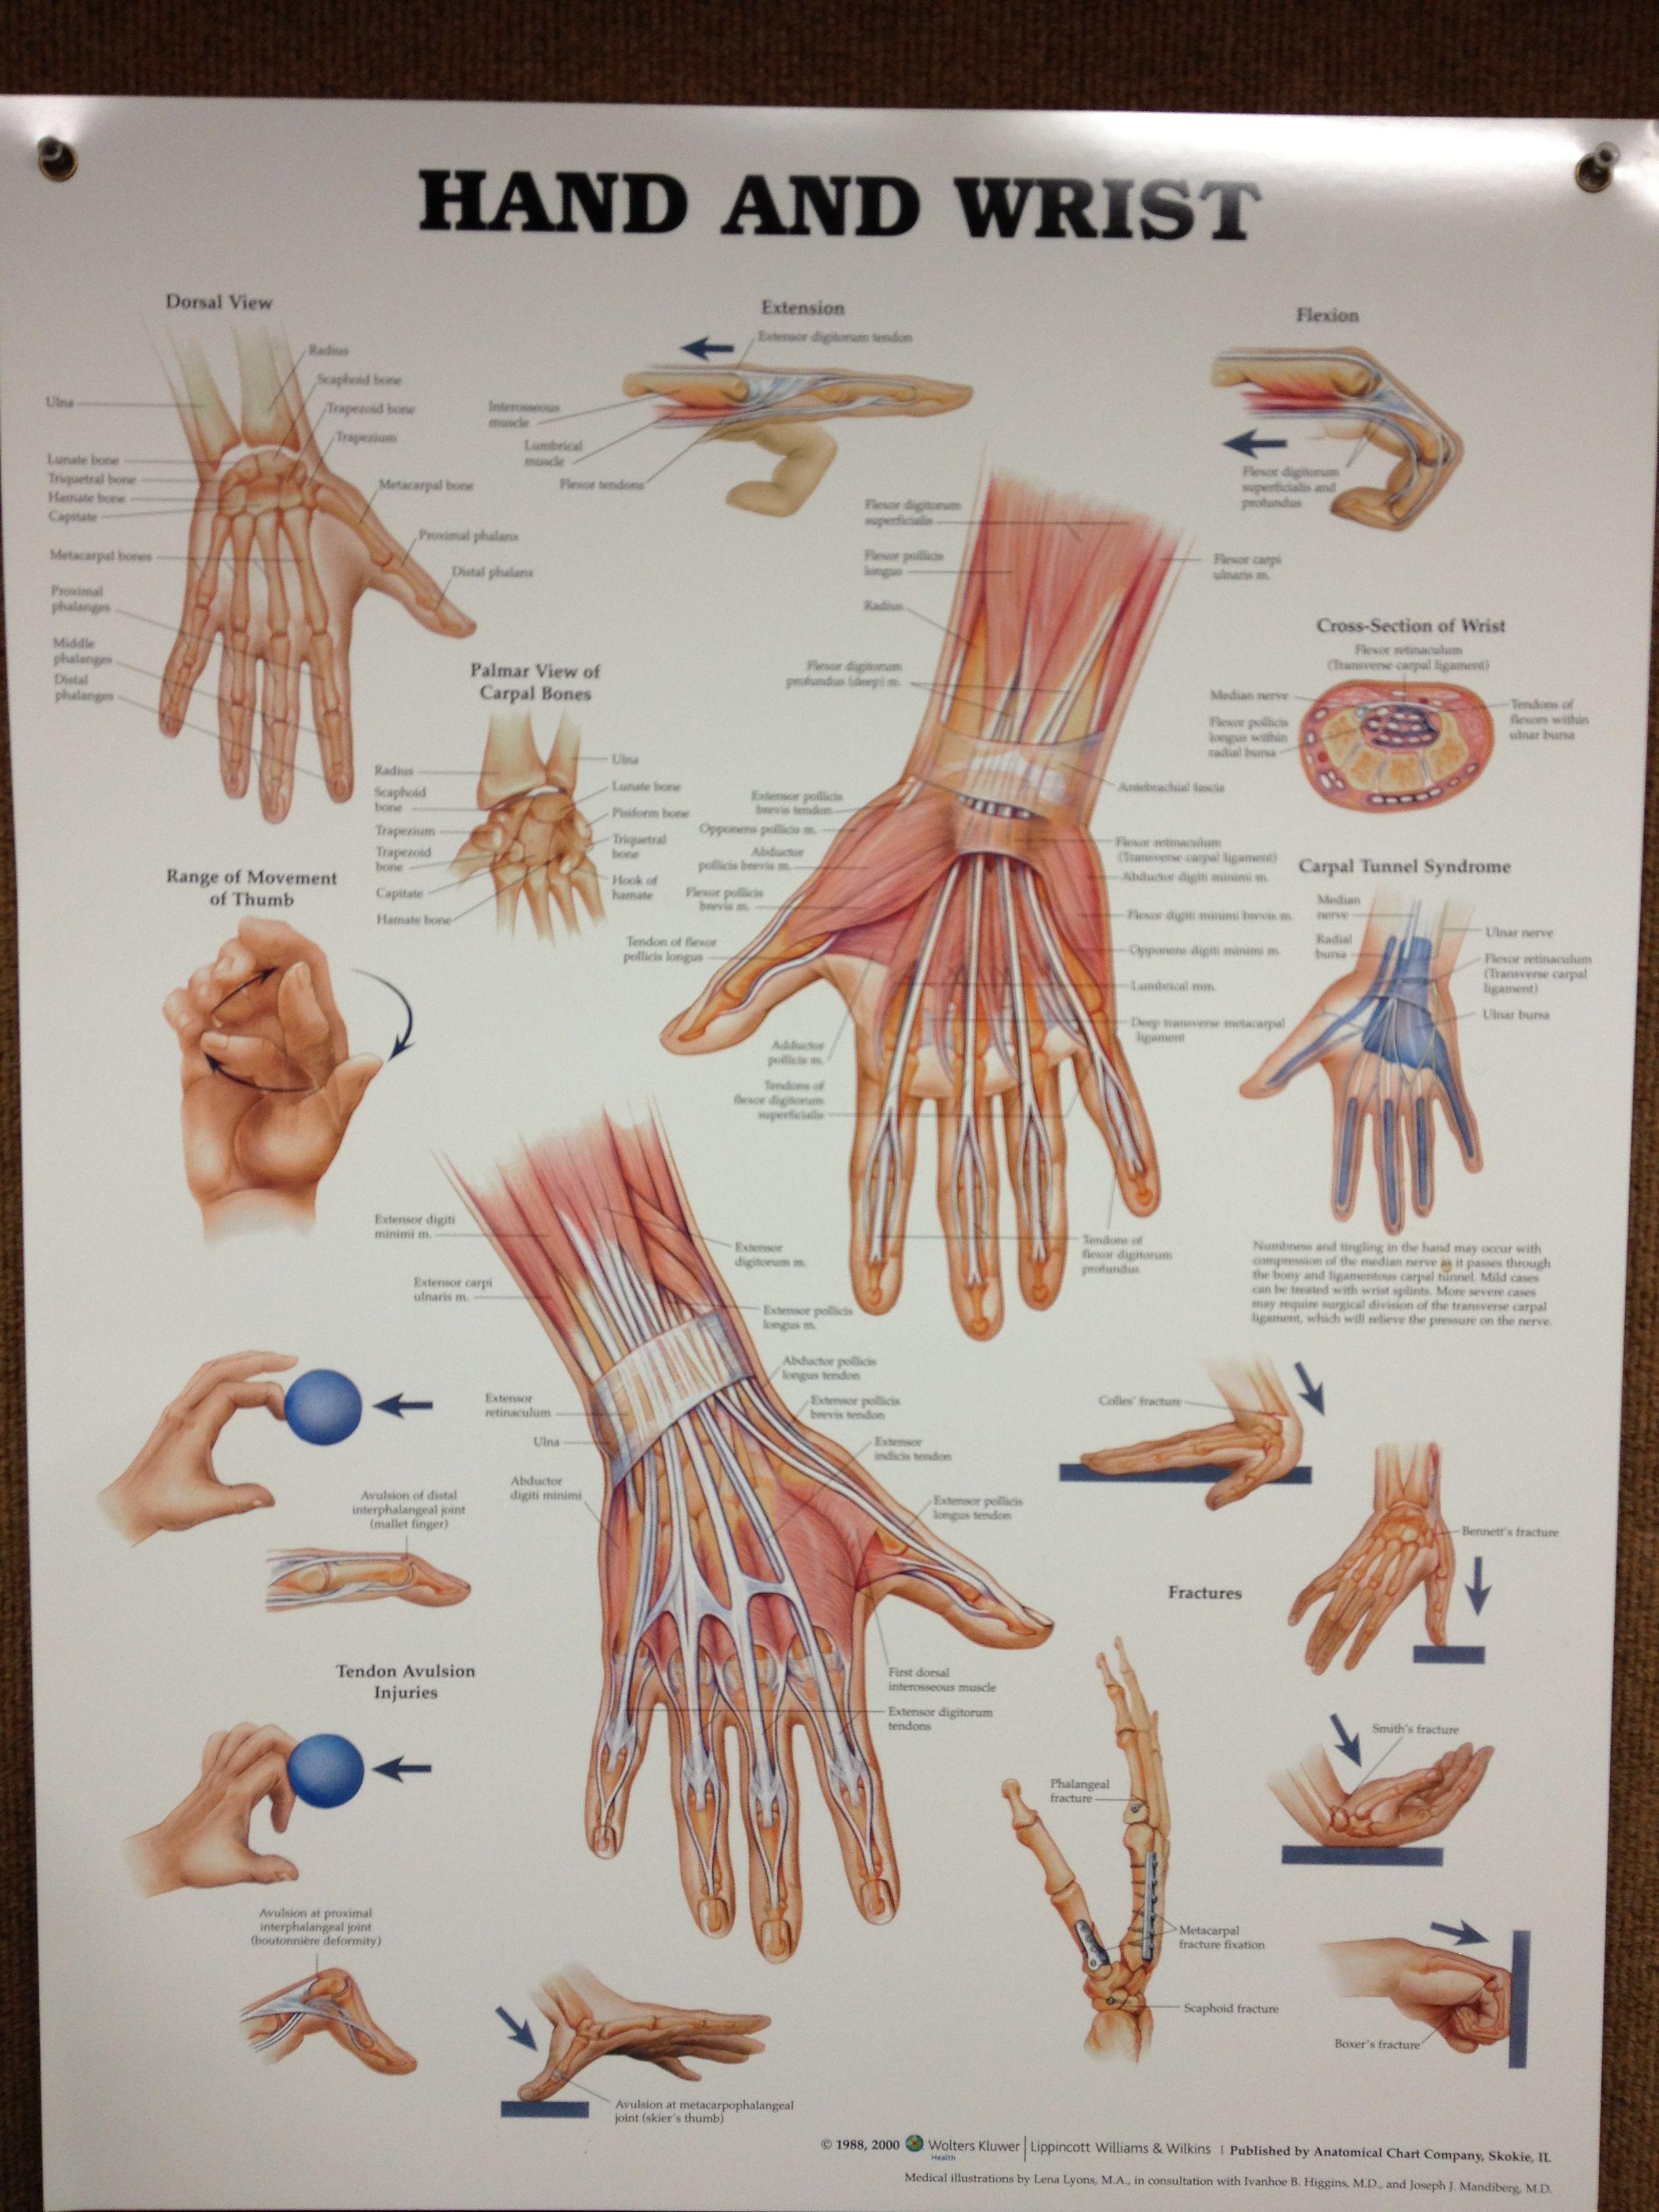 Hand & Wrist | Health :: Bone & Muscles | Pinterest | Hand wrist and ...